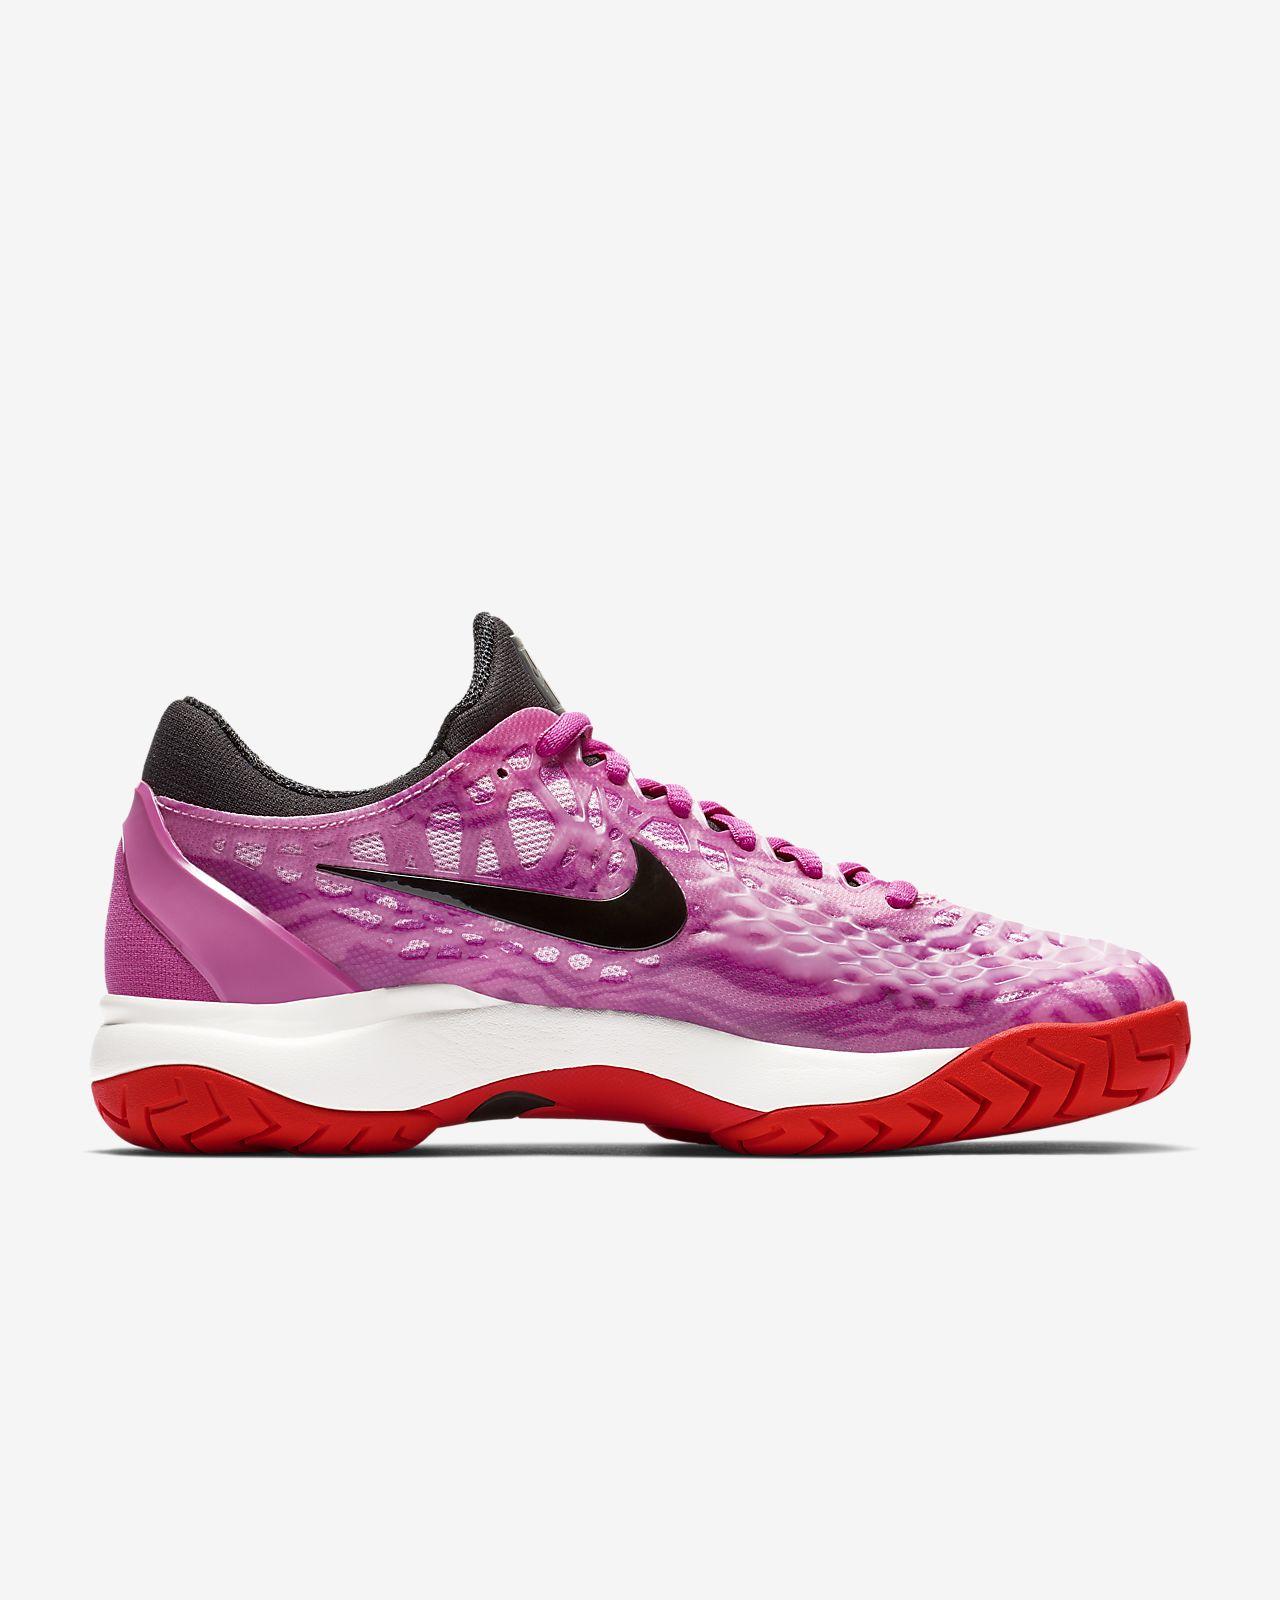 1a3a7ab3a543 NikeCourt Zoom Cage 3 Women s Hard Court Tennis Shoe. Nike.com AU